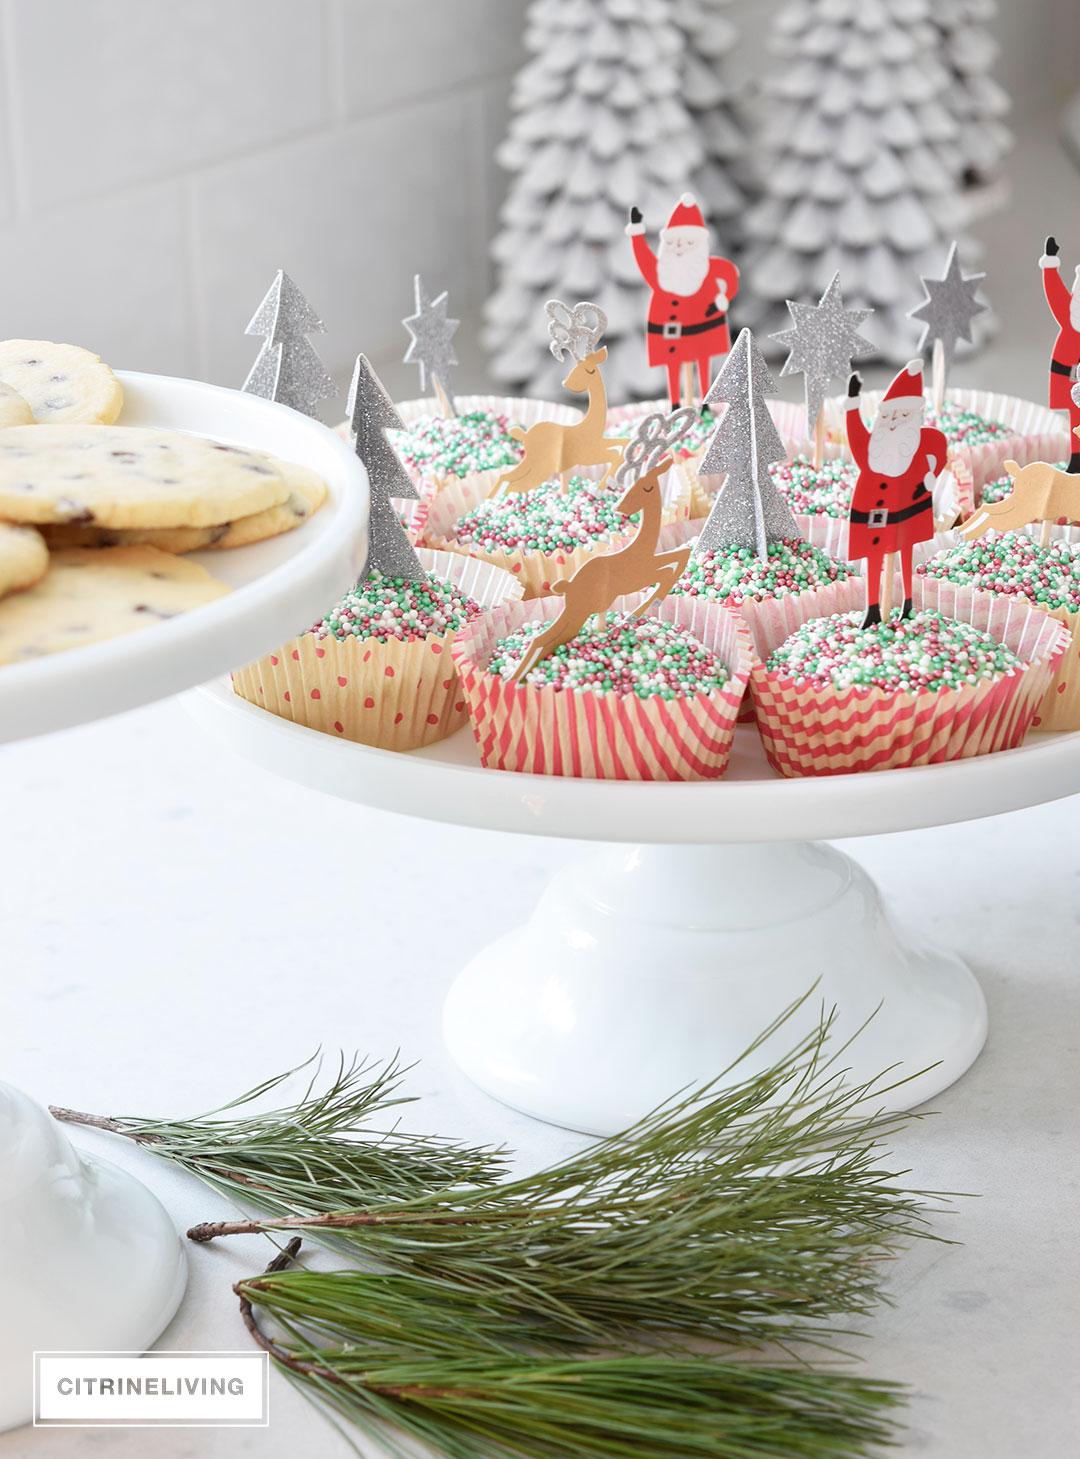 chirstmas-cupcakes-decorated